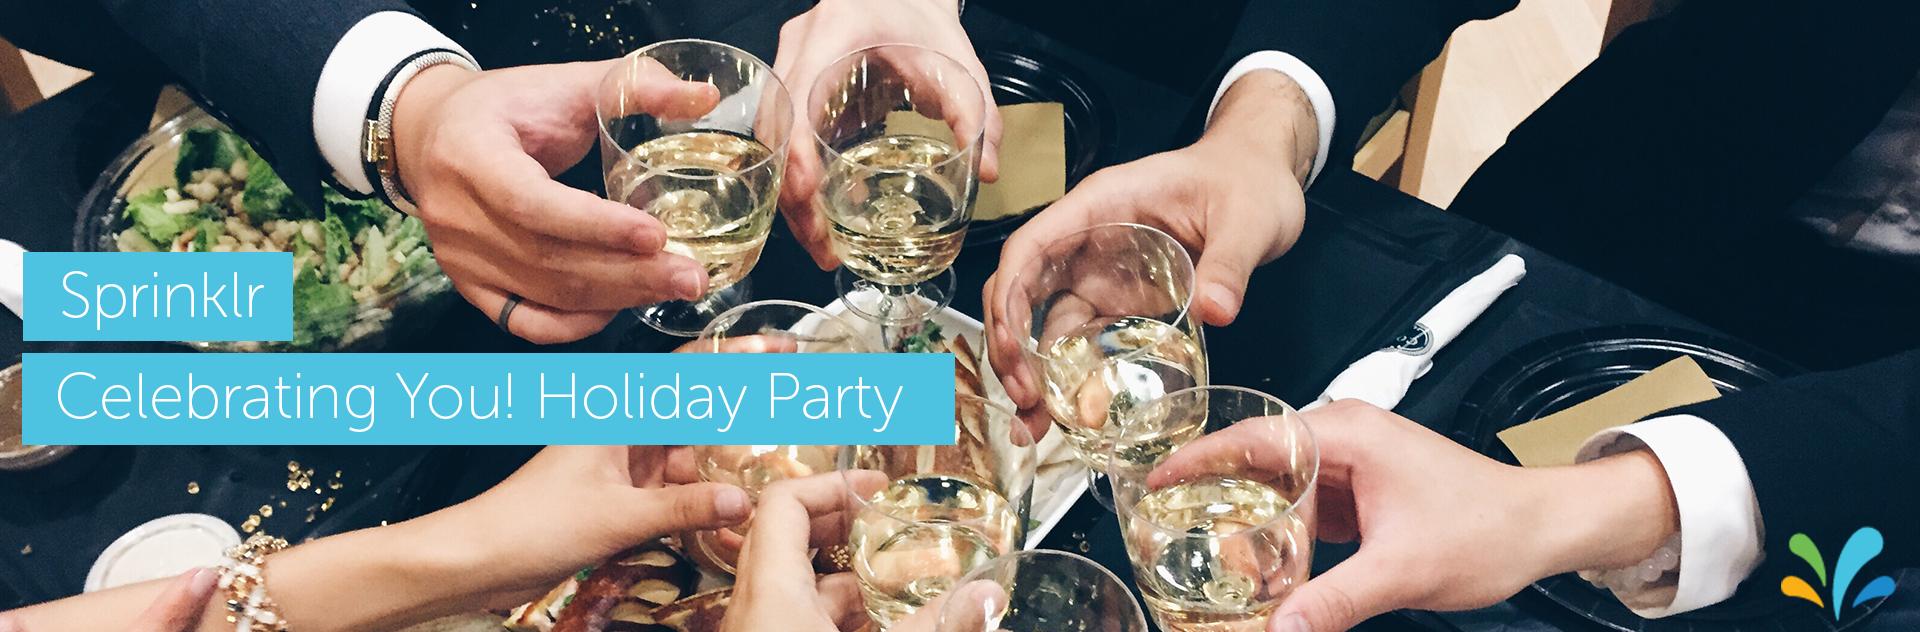 Sprinklr Celebrating You! Holiday Party